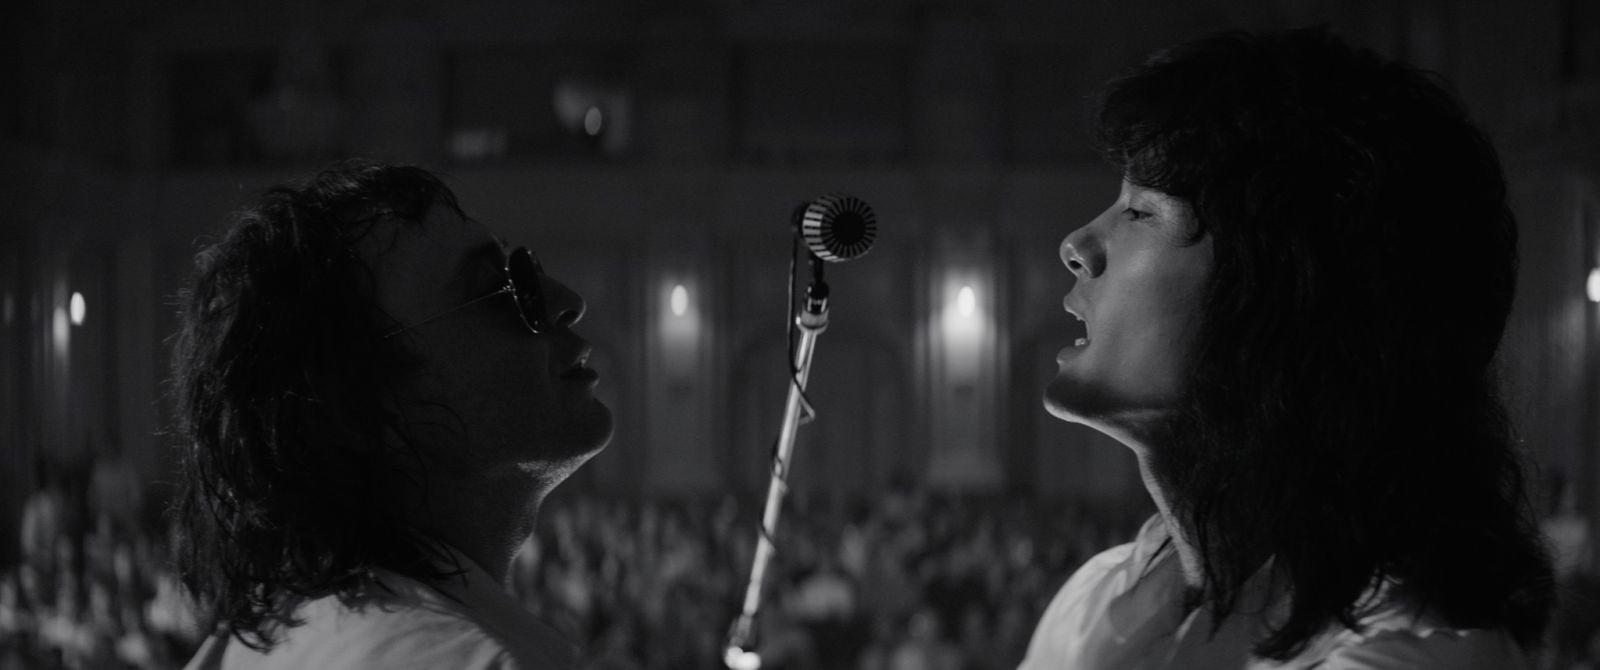 Кадр из фильма «Лето»